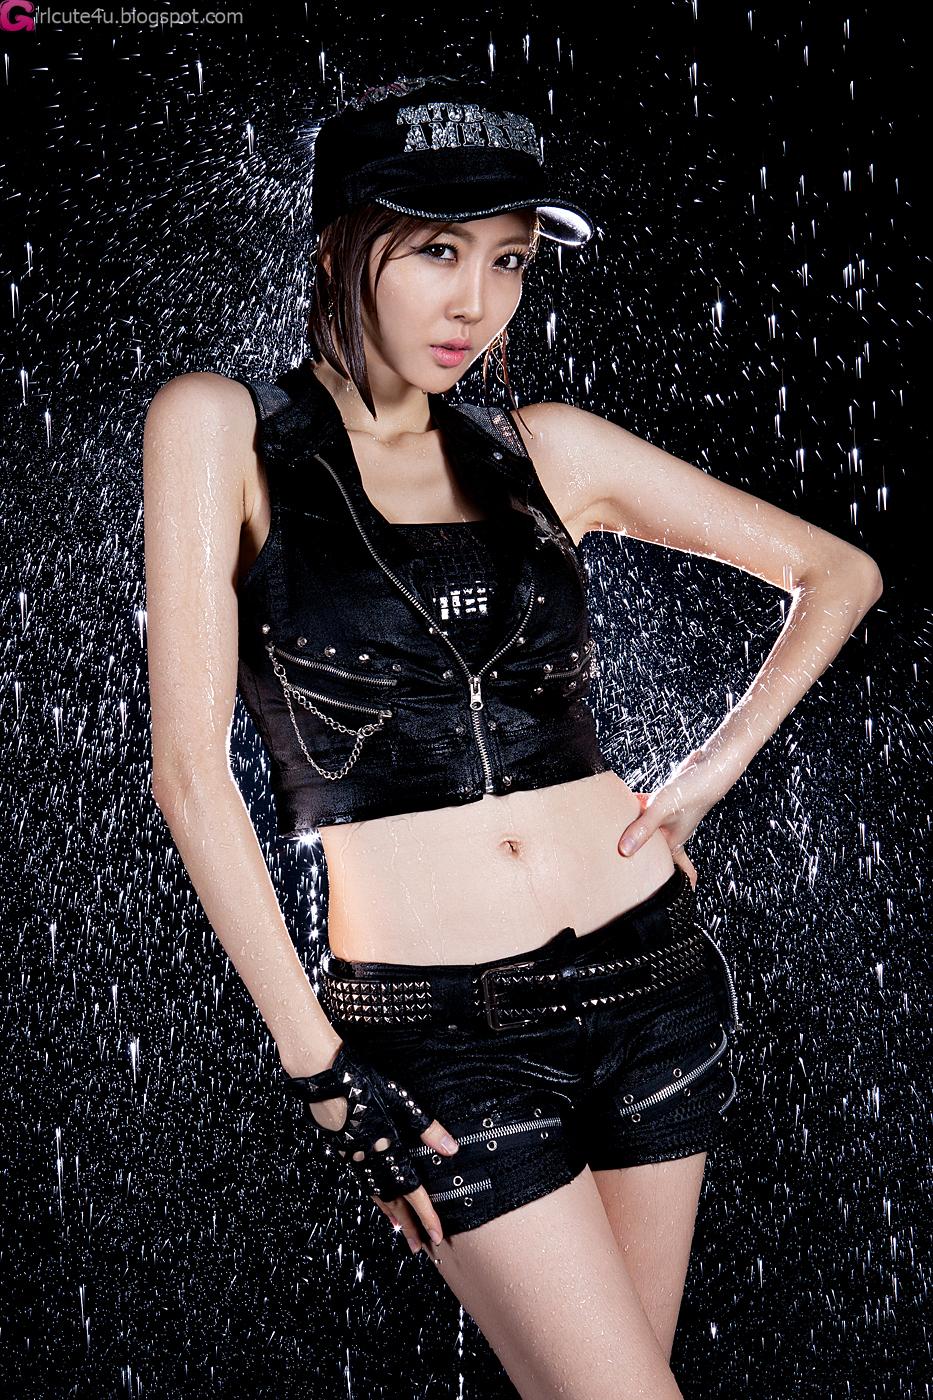 xxx nude girls: Choi Byeol Ha in White